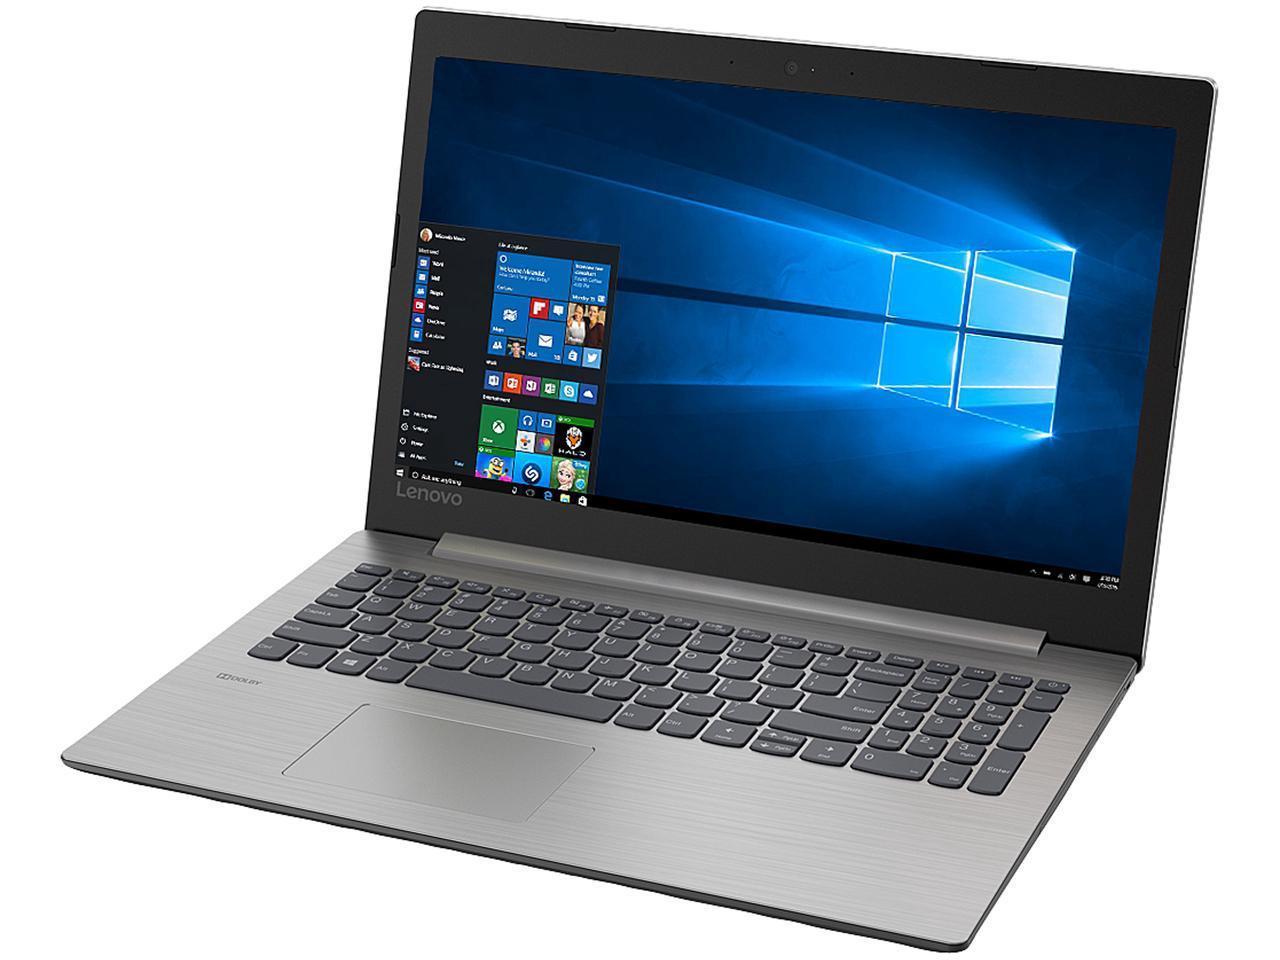 "Lenovo Laptop IdeaPad 330 81D2005CUS AMD Ryzen 5 2500U (2.00 GHz) 8 GB Memory 256 GB SSD AMD Radeon Vega 8 15.6"" Windows 10 Home 64-Bit - $479.99"